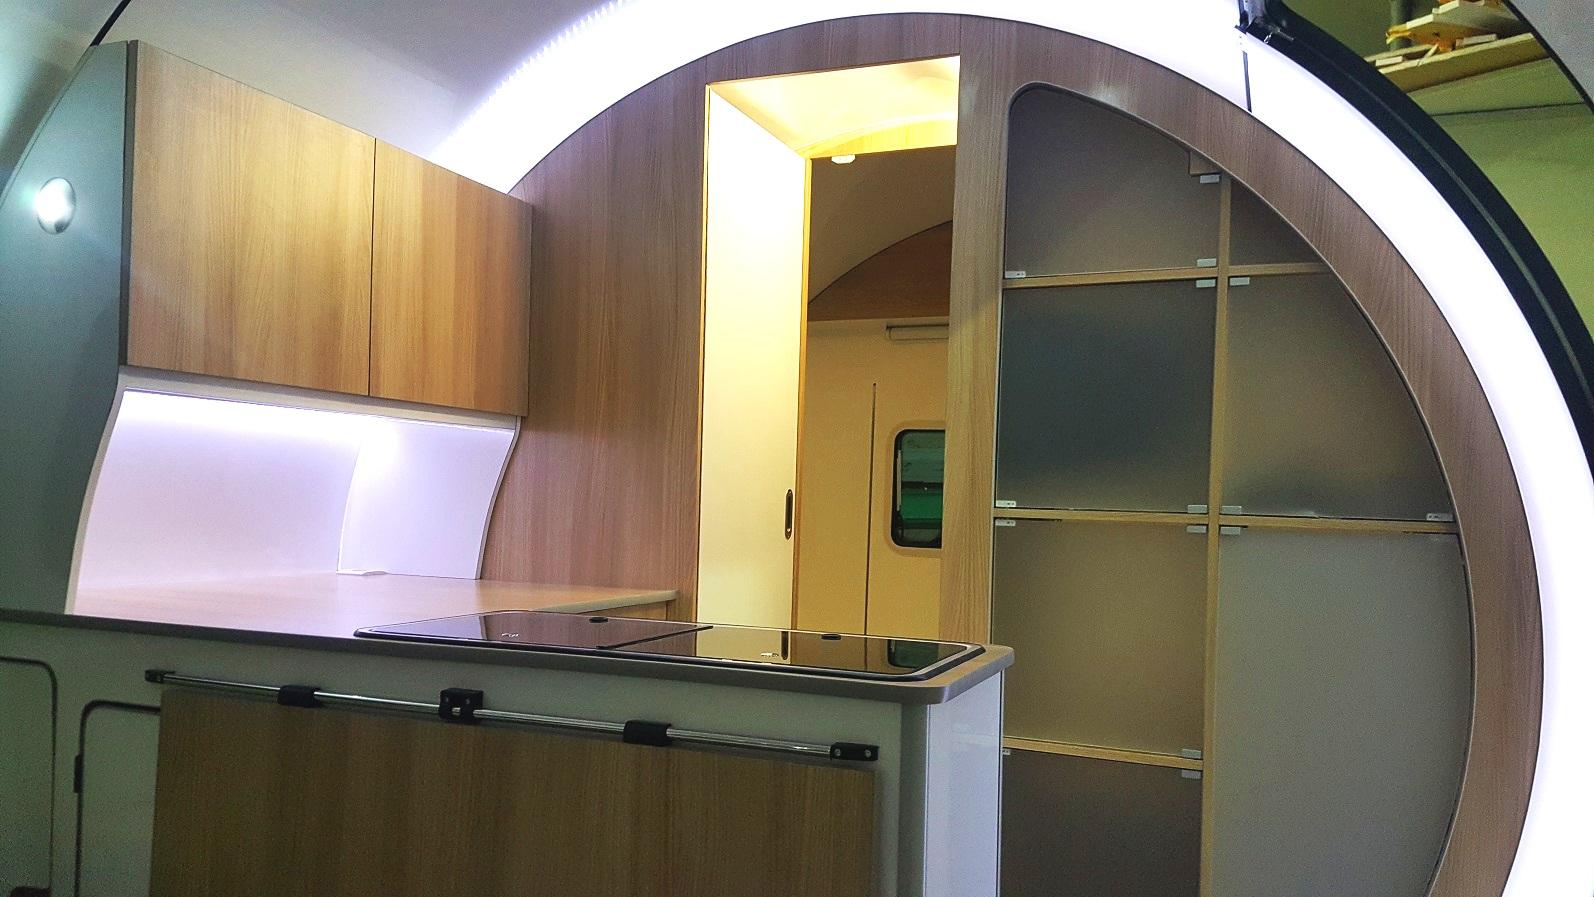 3X kitchen - white interior, wood cupboards, clear acrylic storage pods